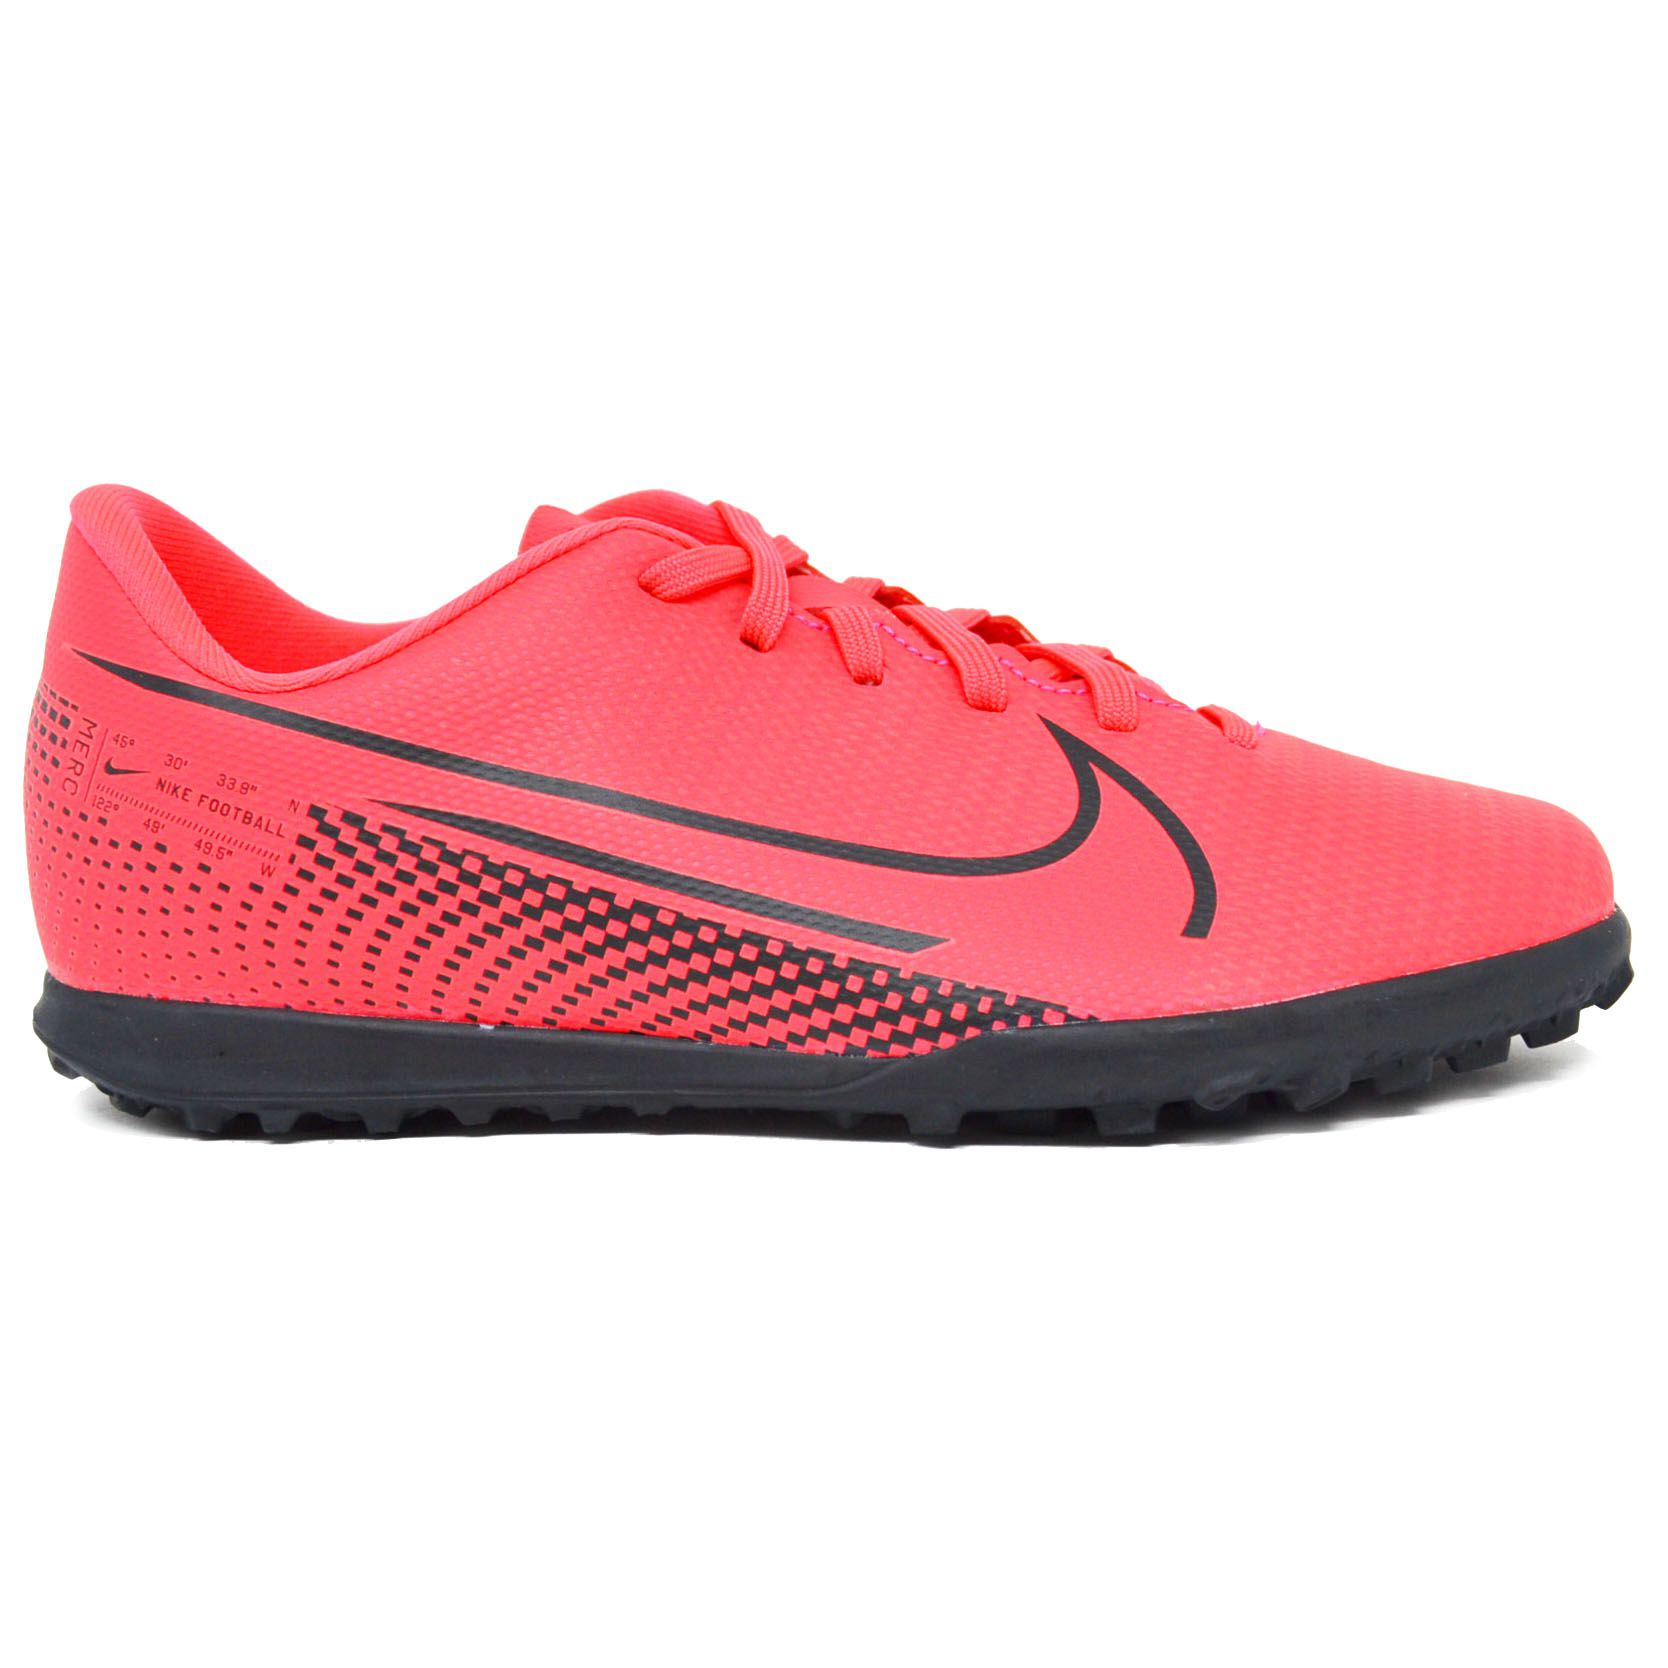 Chuteira Society Nike Mercurial JR Vapor 13 Club TF